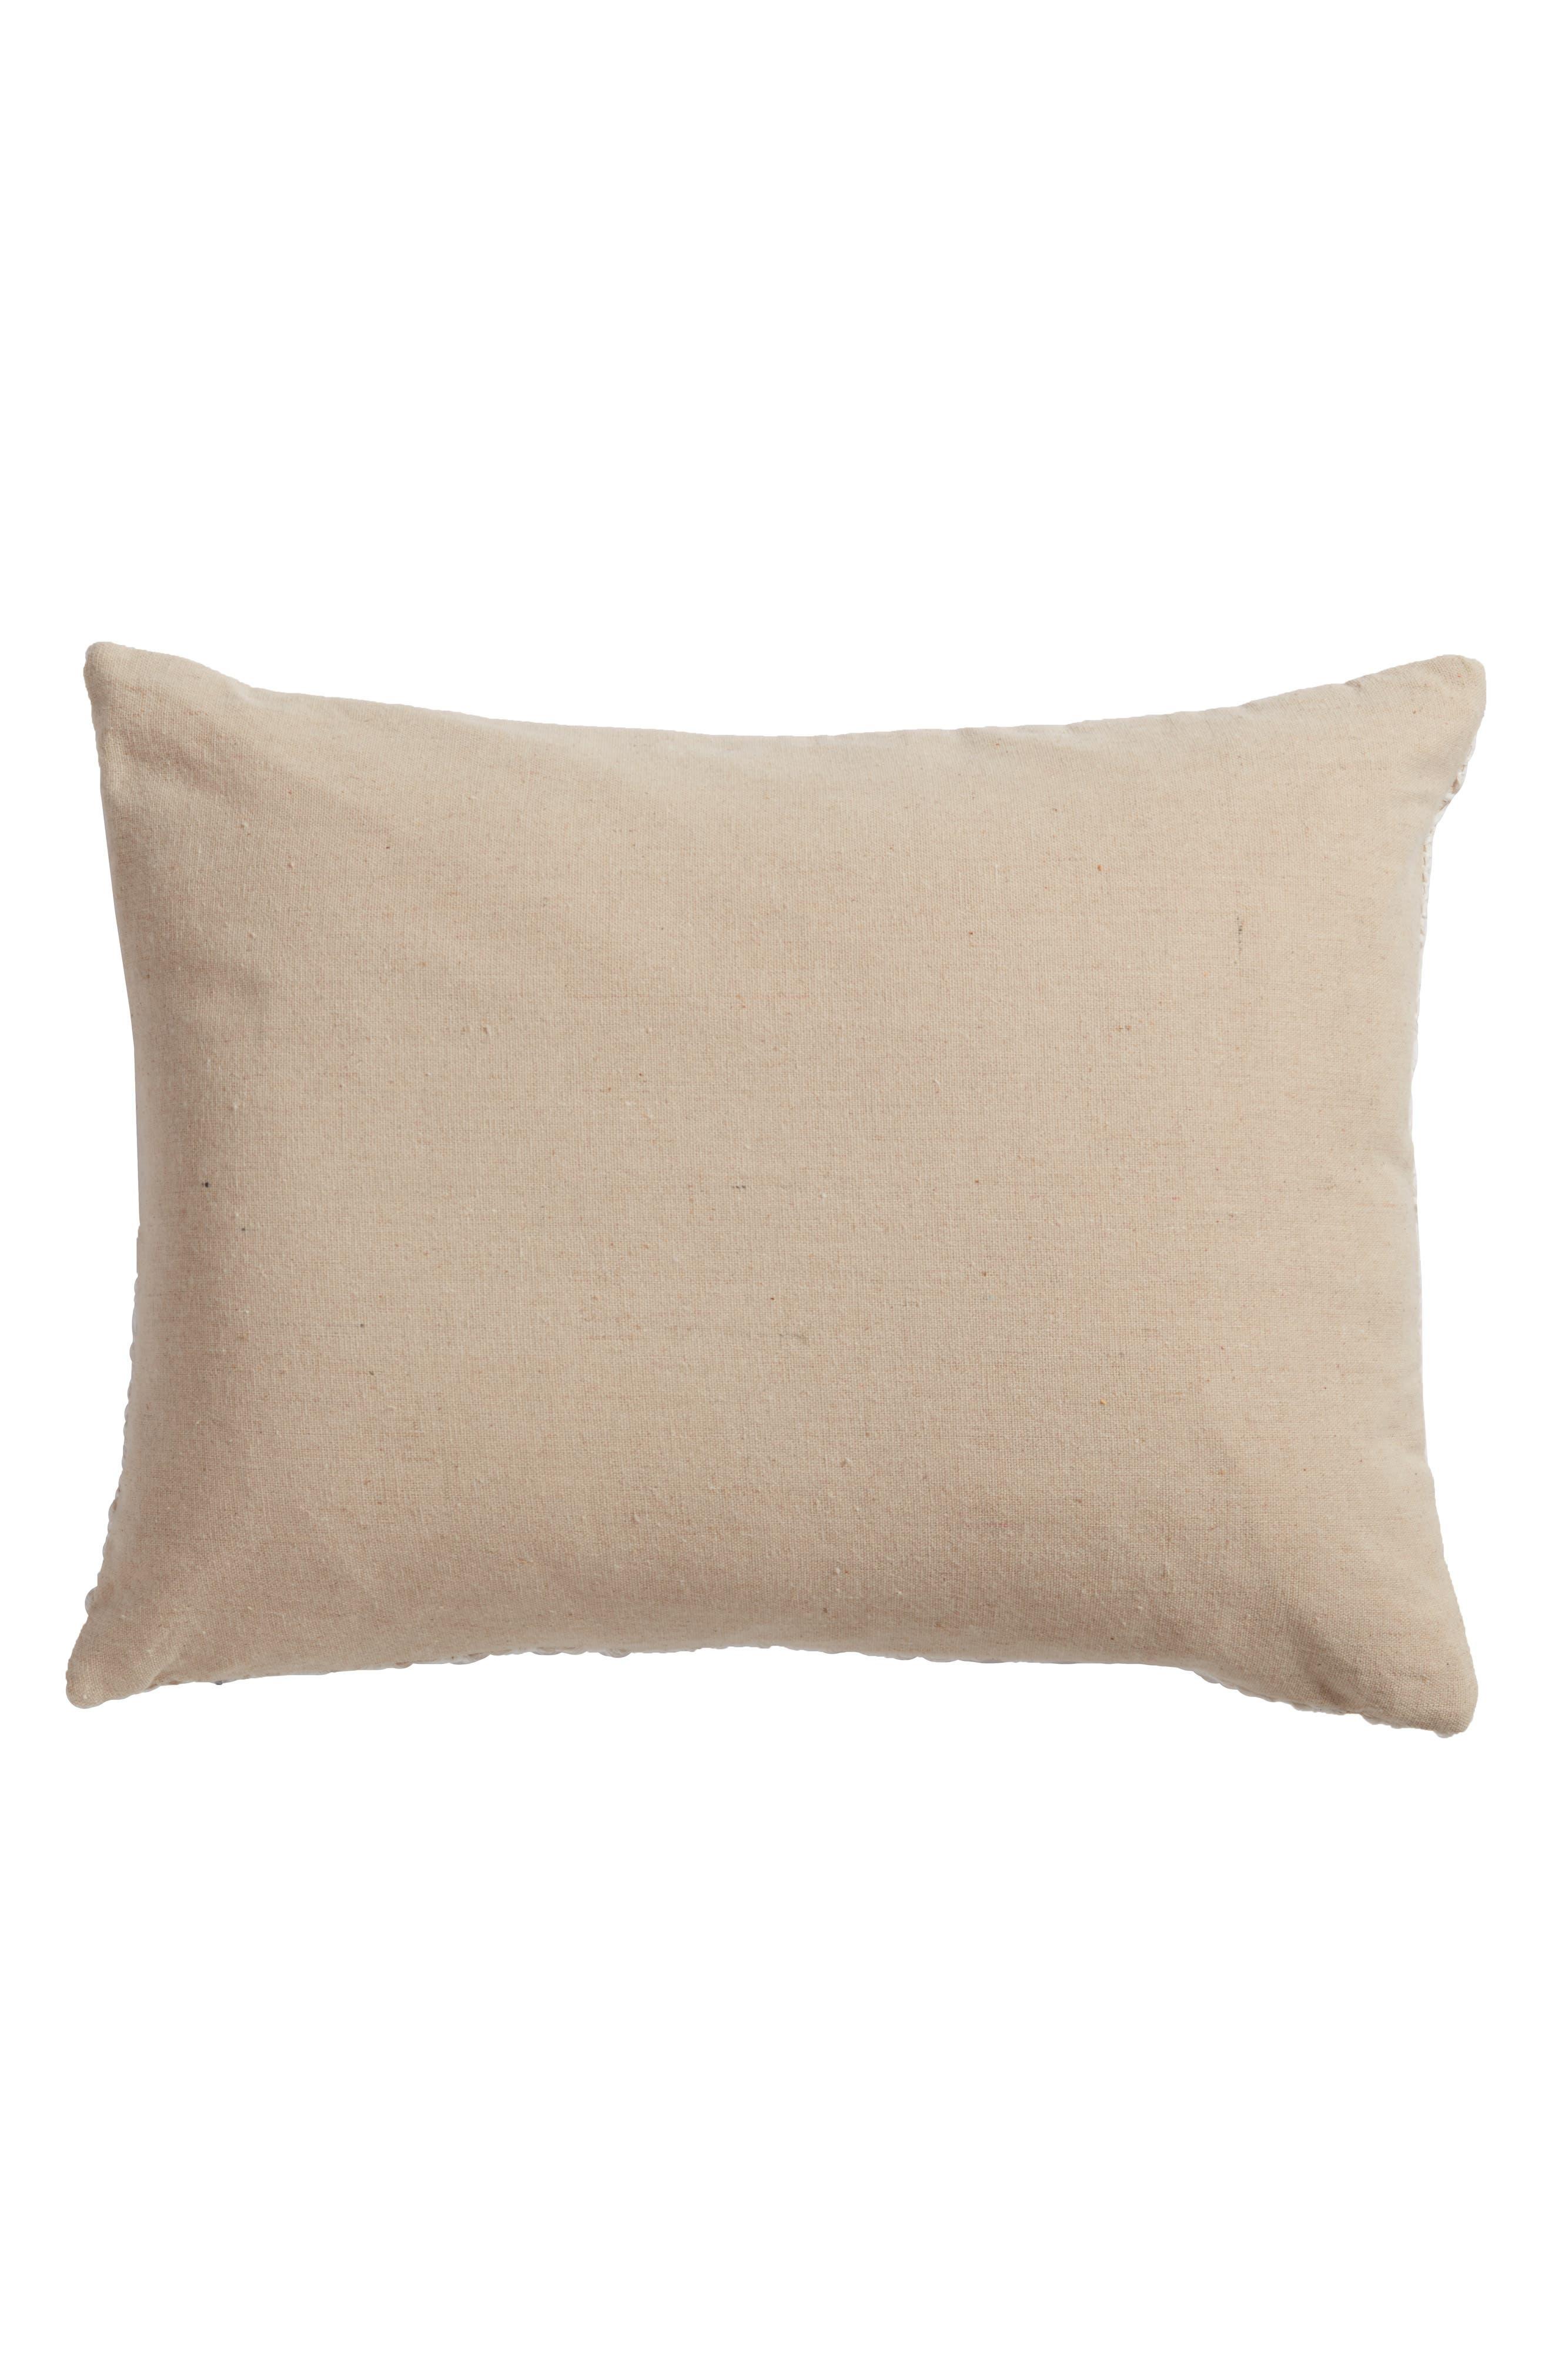 Arden Accent Pillow,                             Alternate thumbnail 2, color,                             Cream